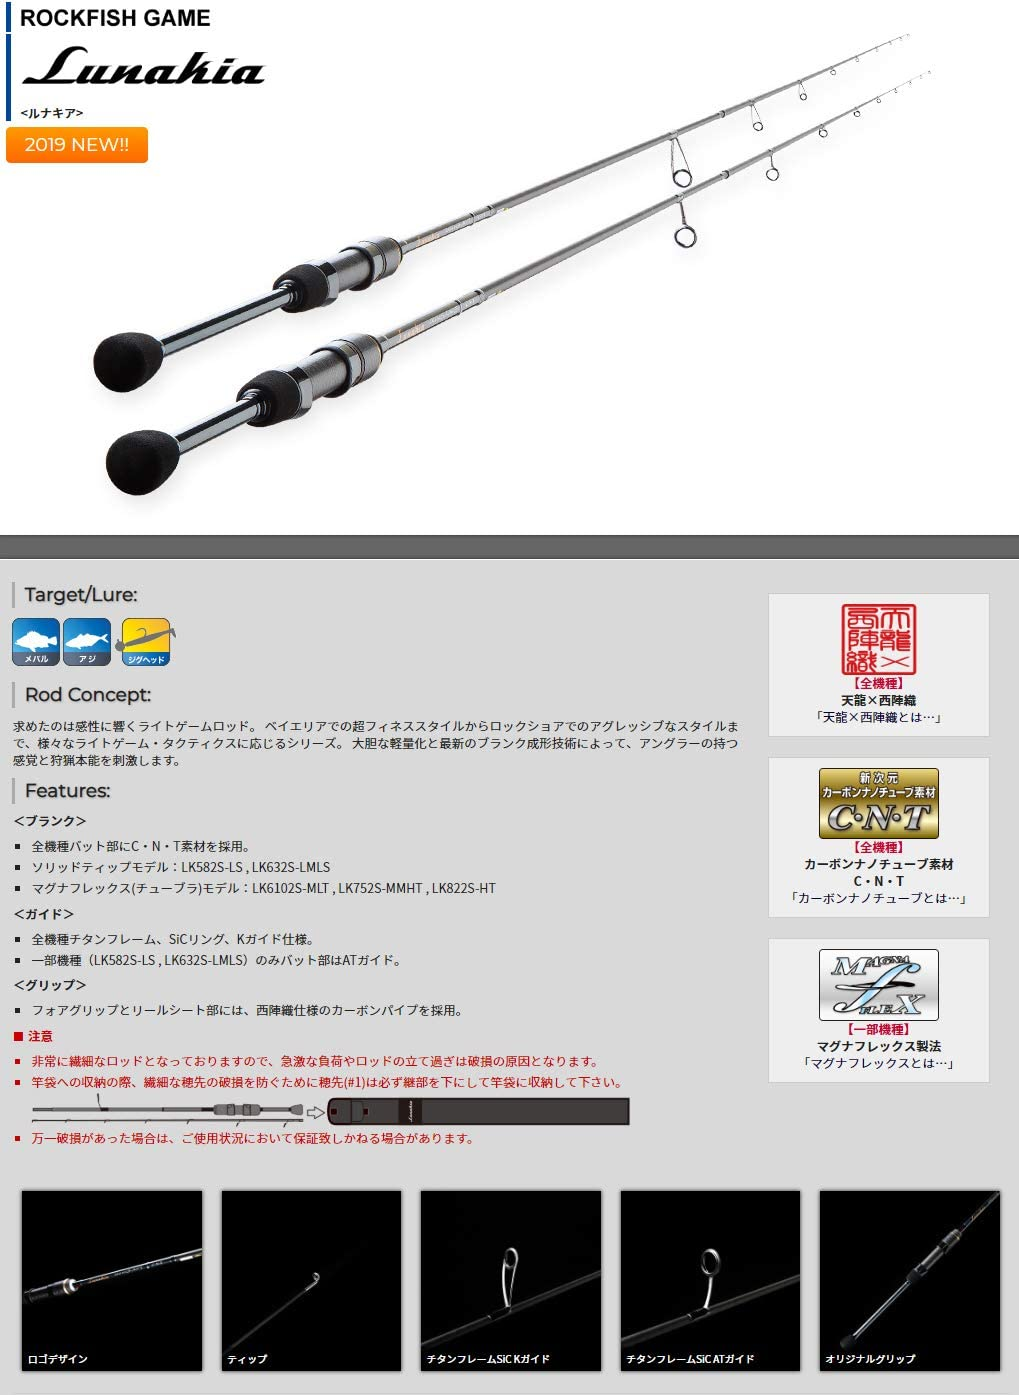 Tenryu Lunakia LK 822 S-HT From Japan